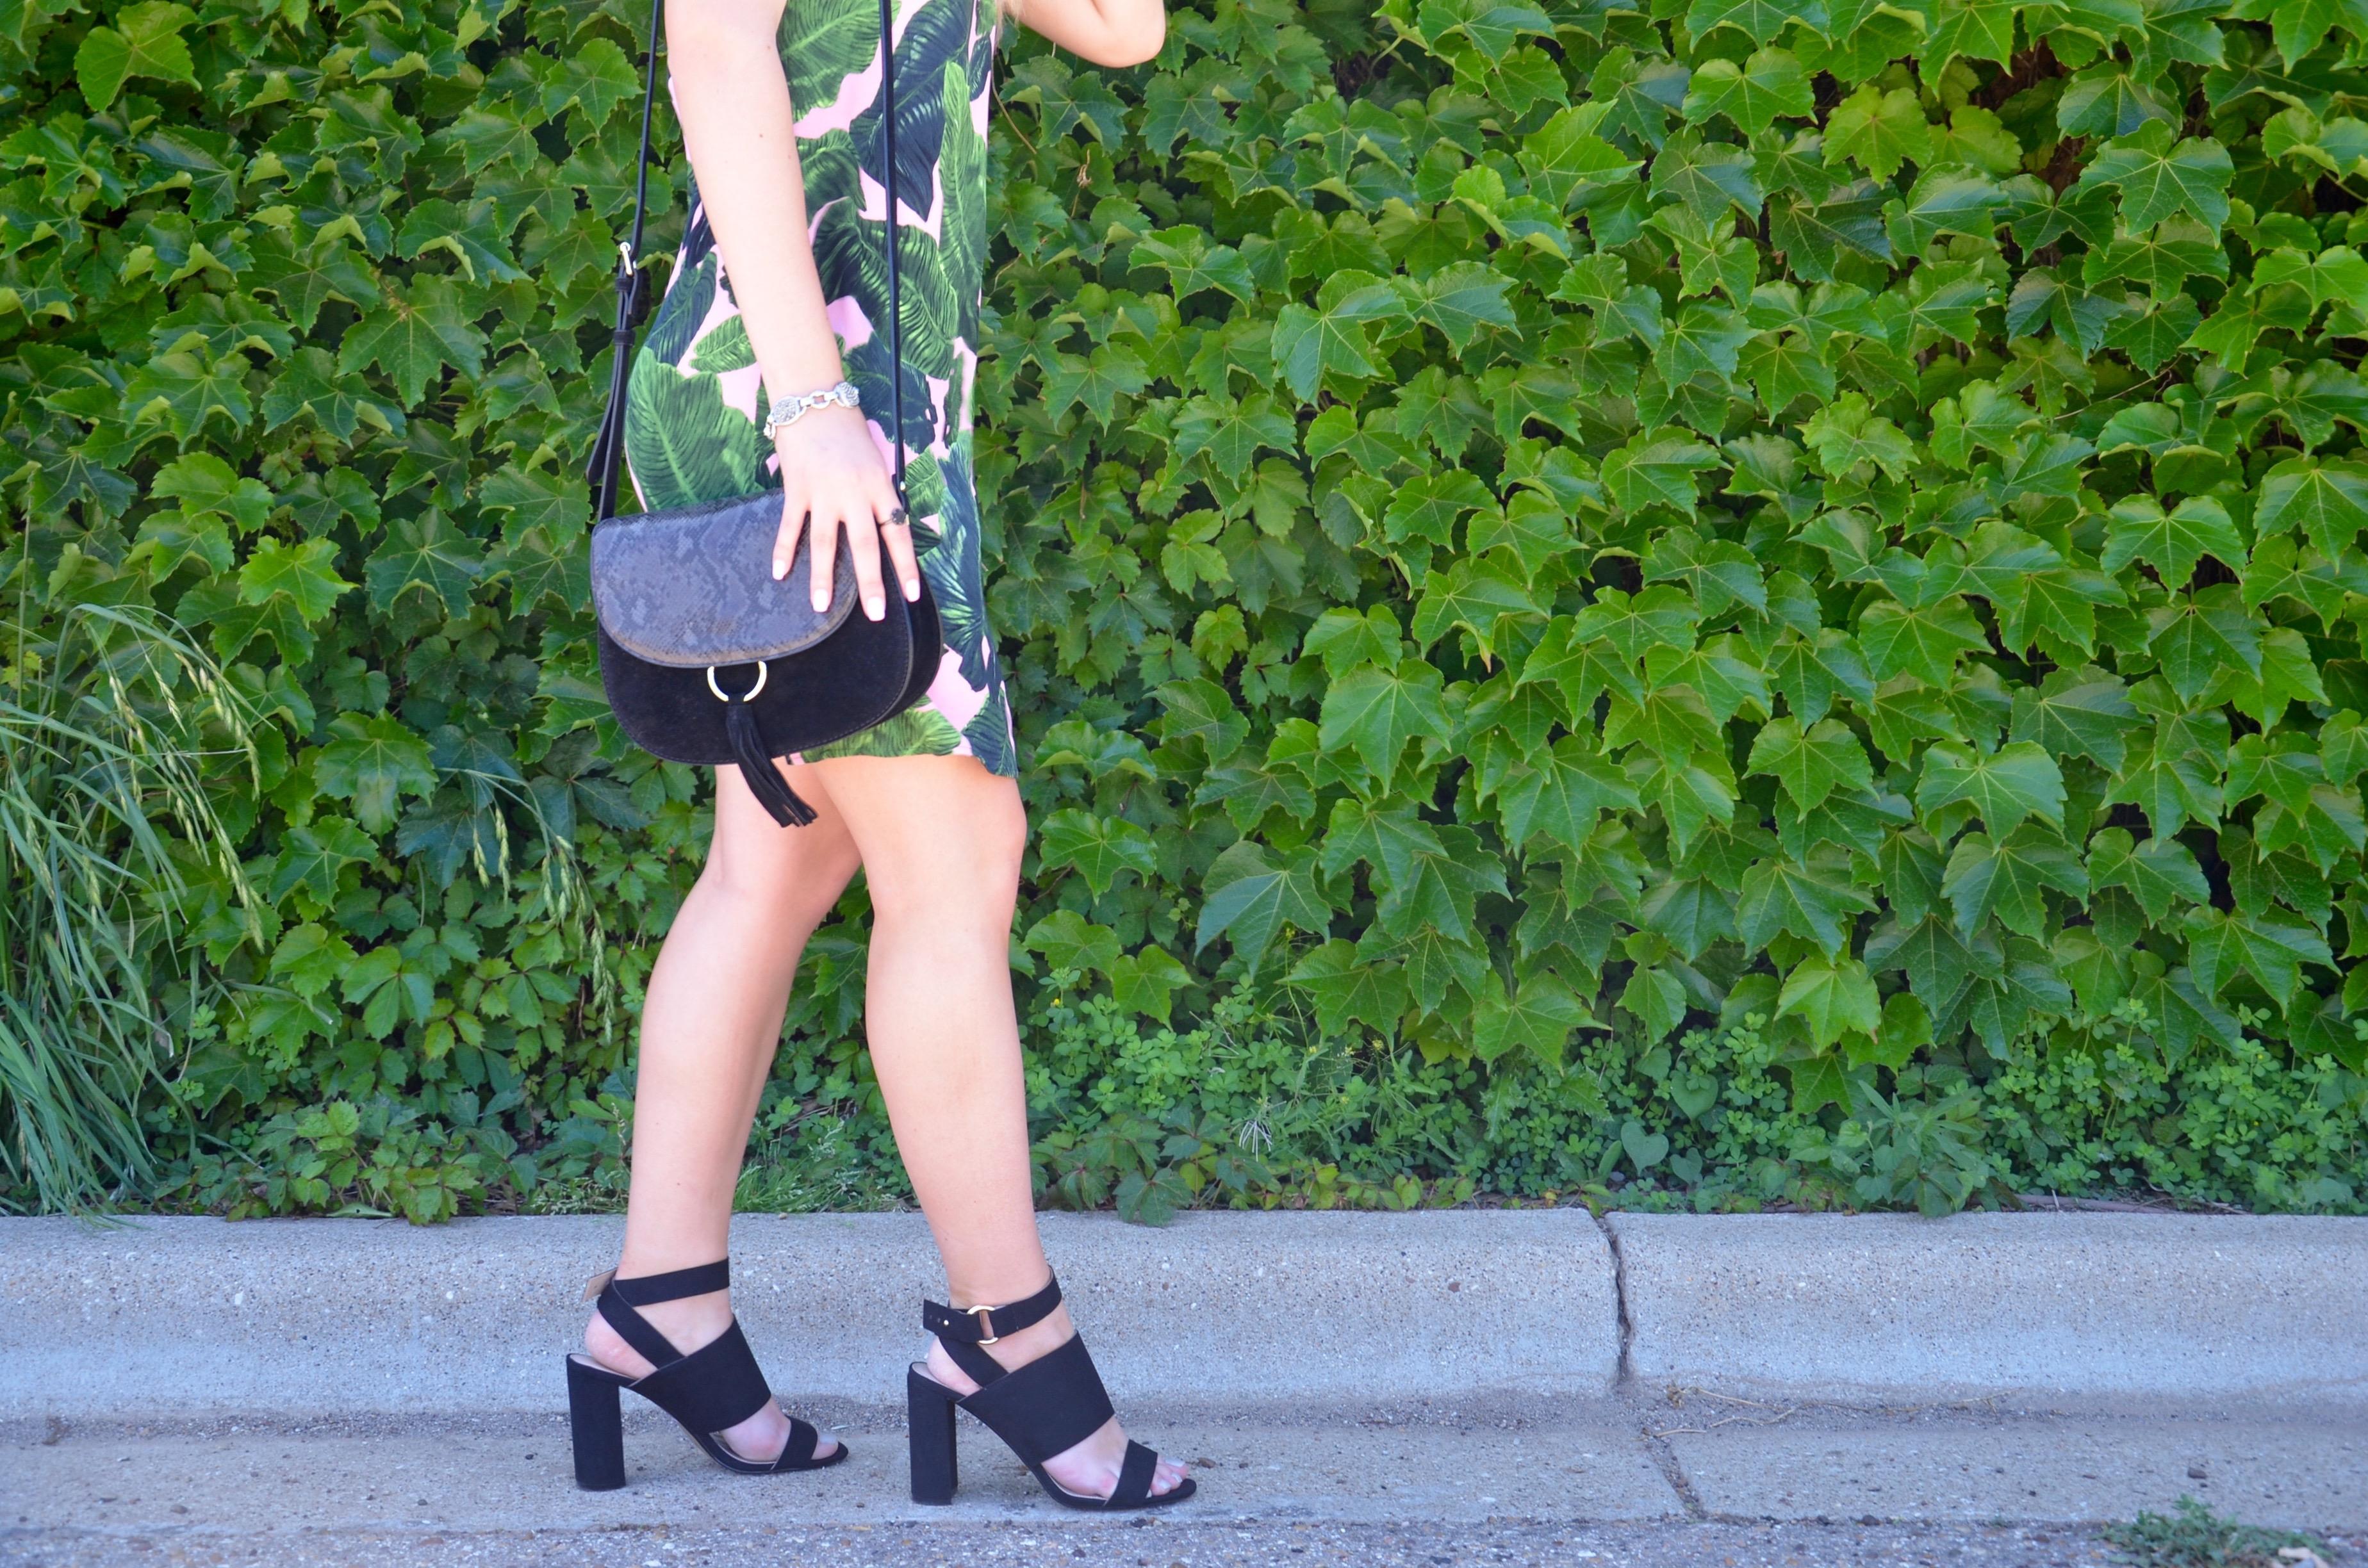 tiptop black heels and saddle bag